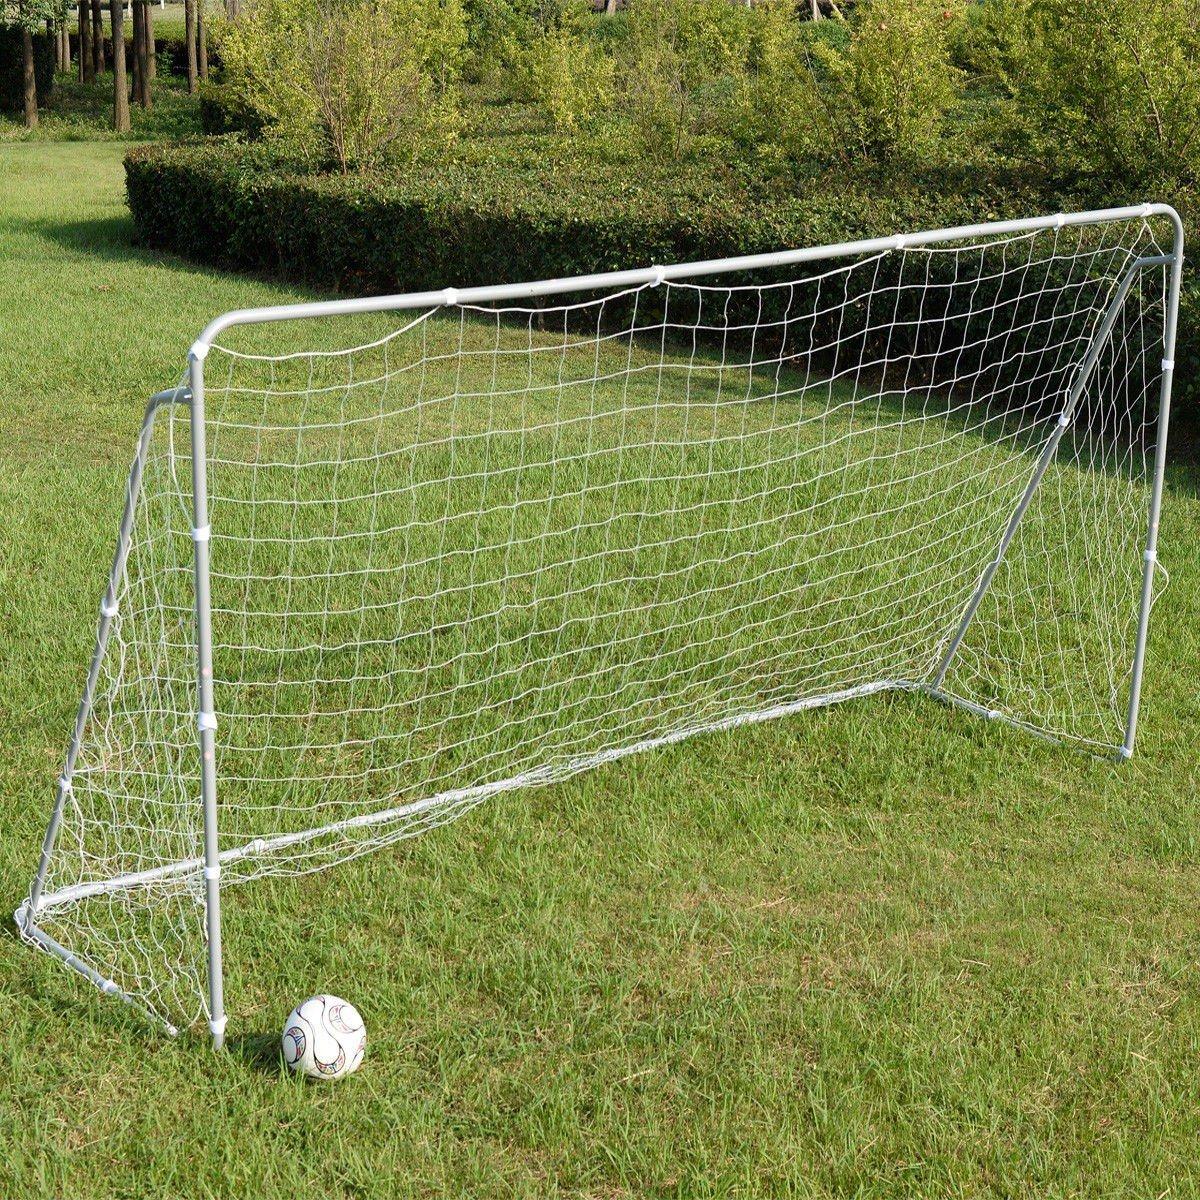 12 ' x 6 ' Soccer Goal w / Netベルクロストラップ、アンカーボールトレーニングセットBU – Choice製品 B0749PY3Z7